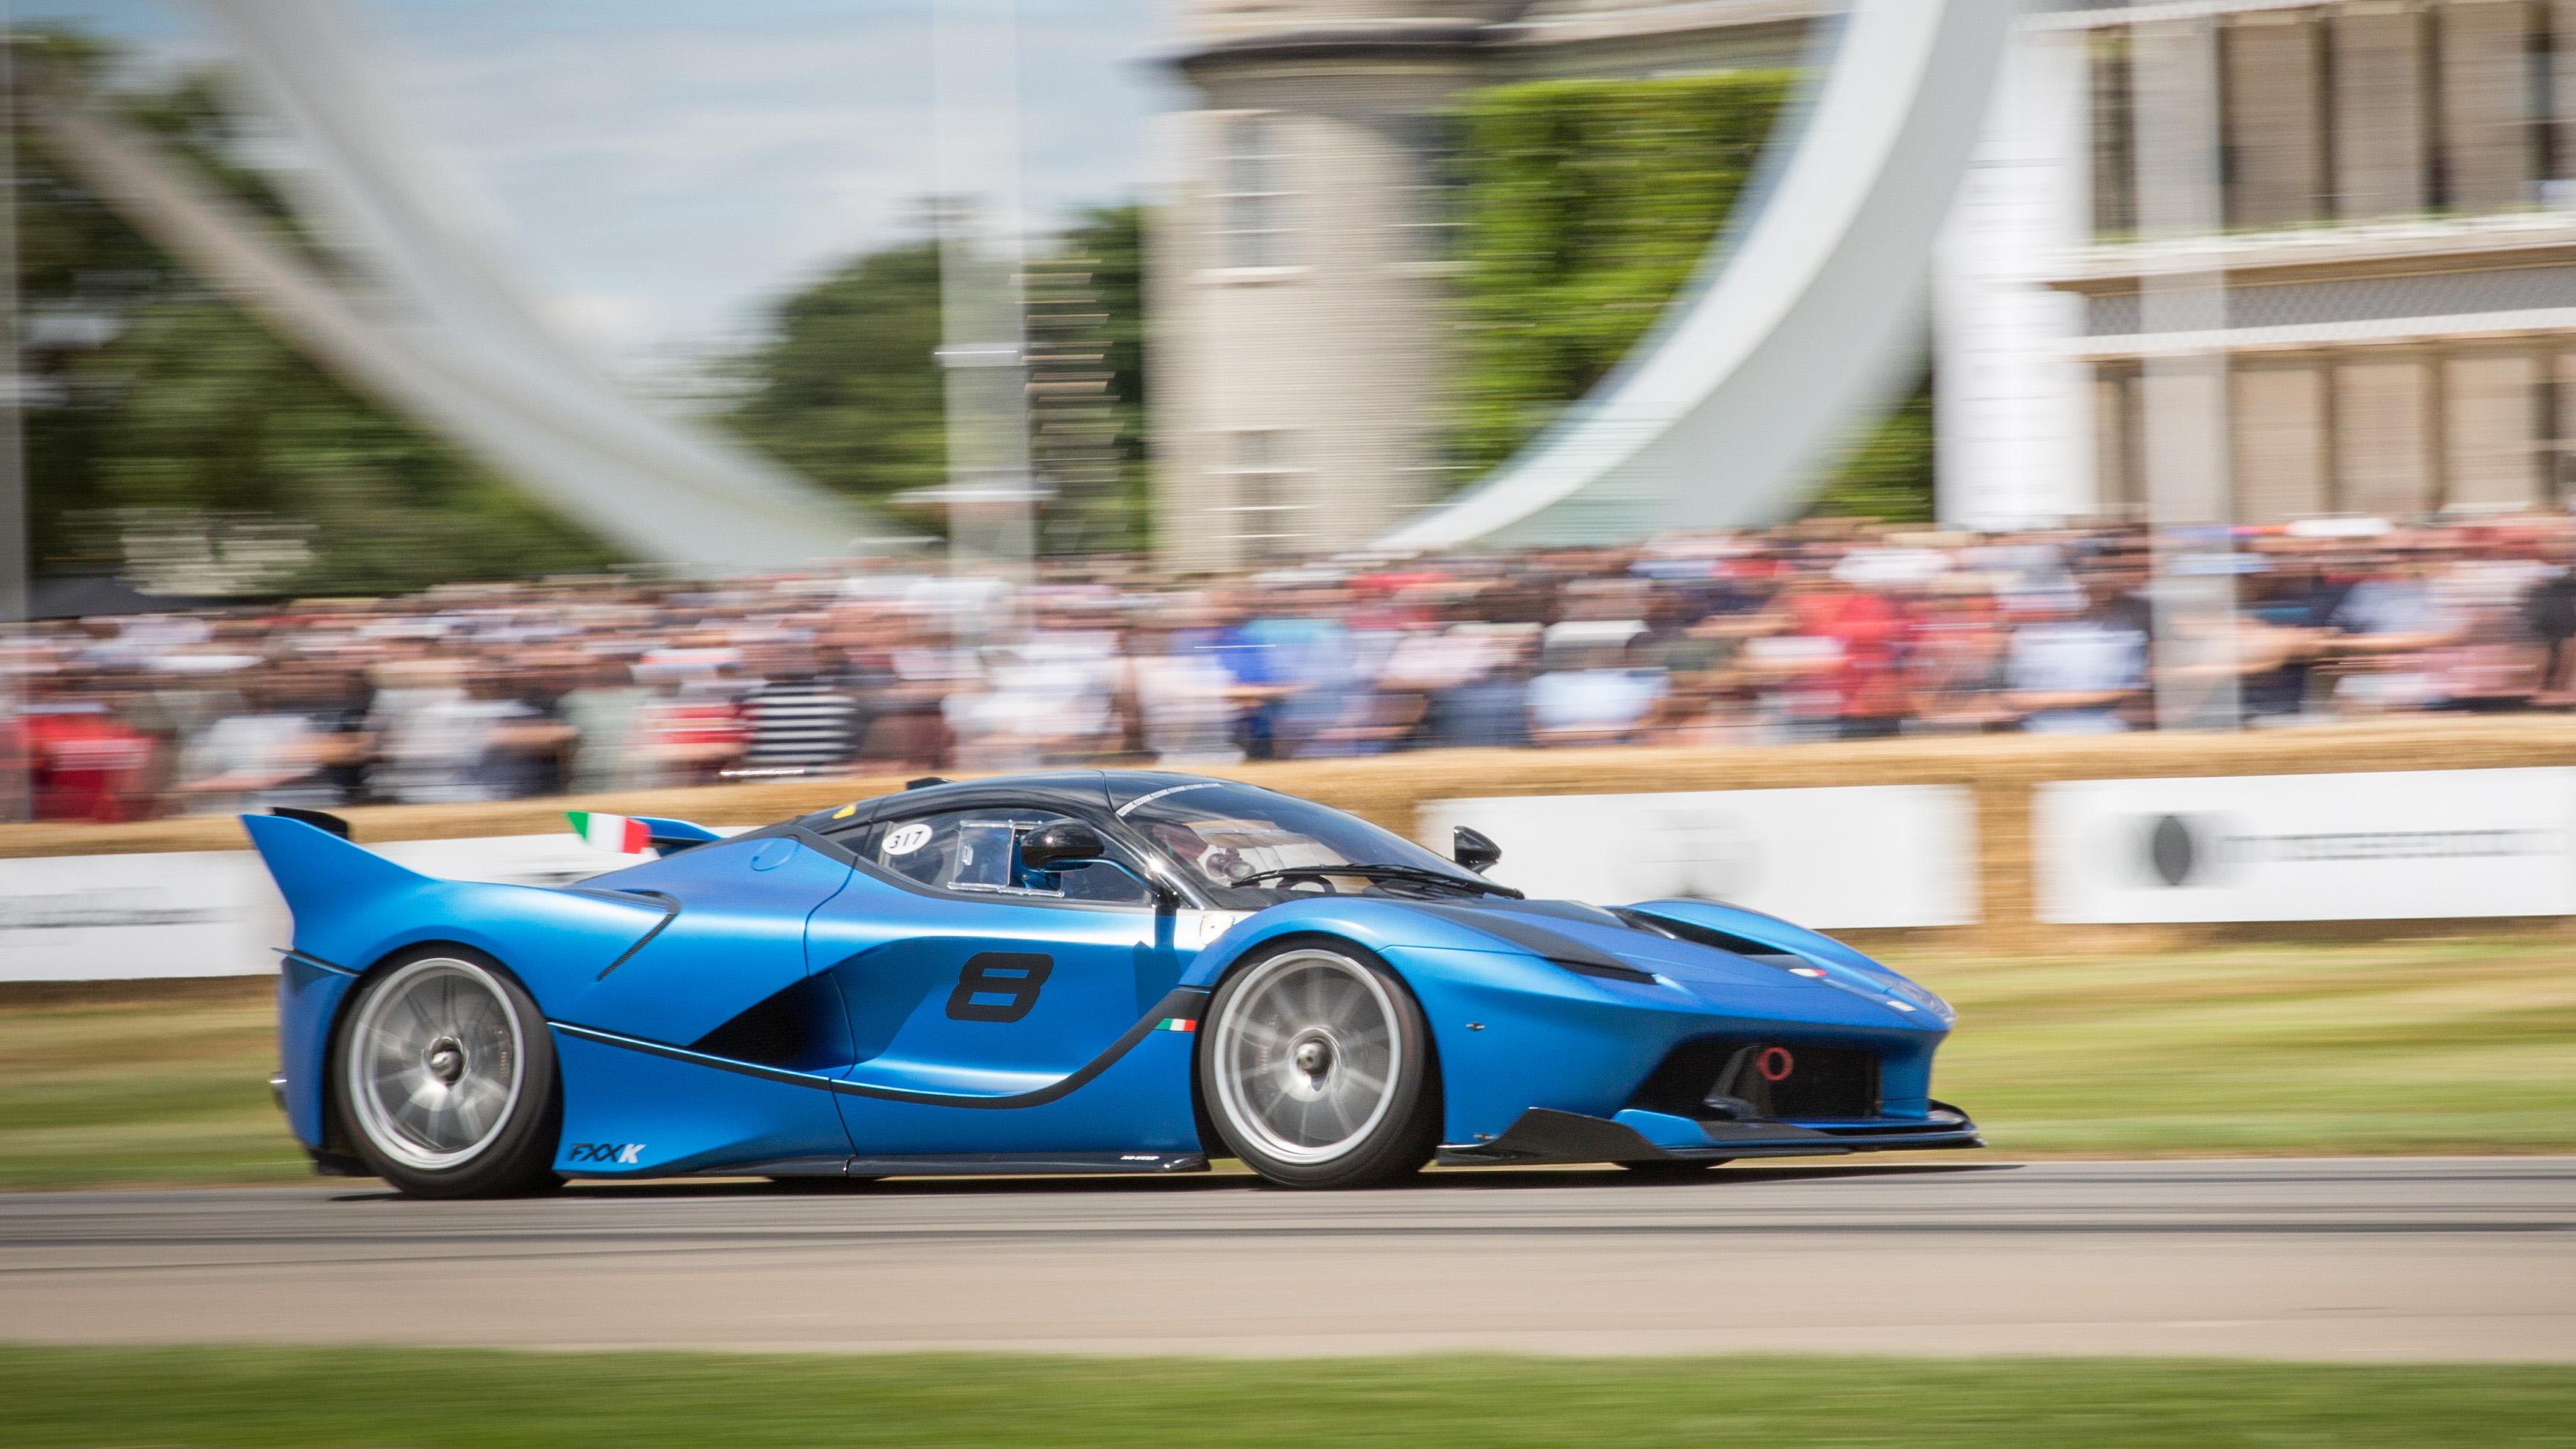 Ferrari at Goodwood Festival of Speed 2017